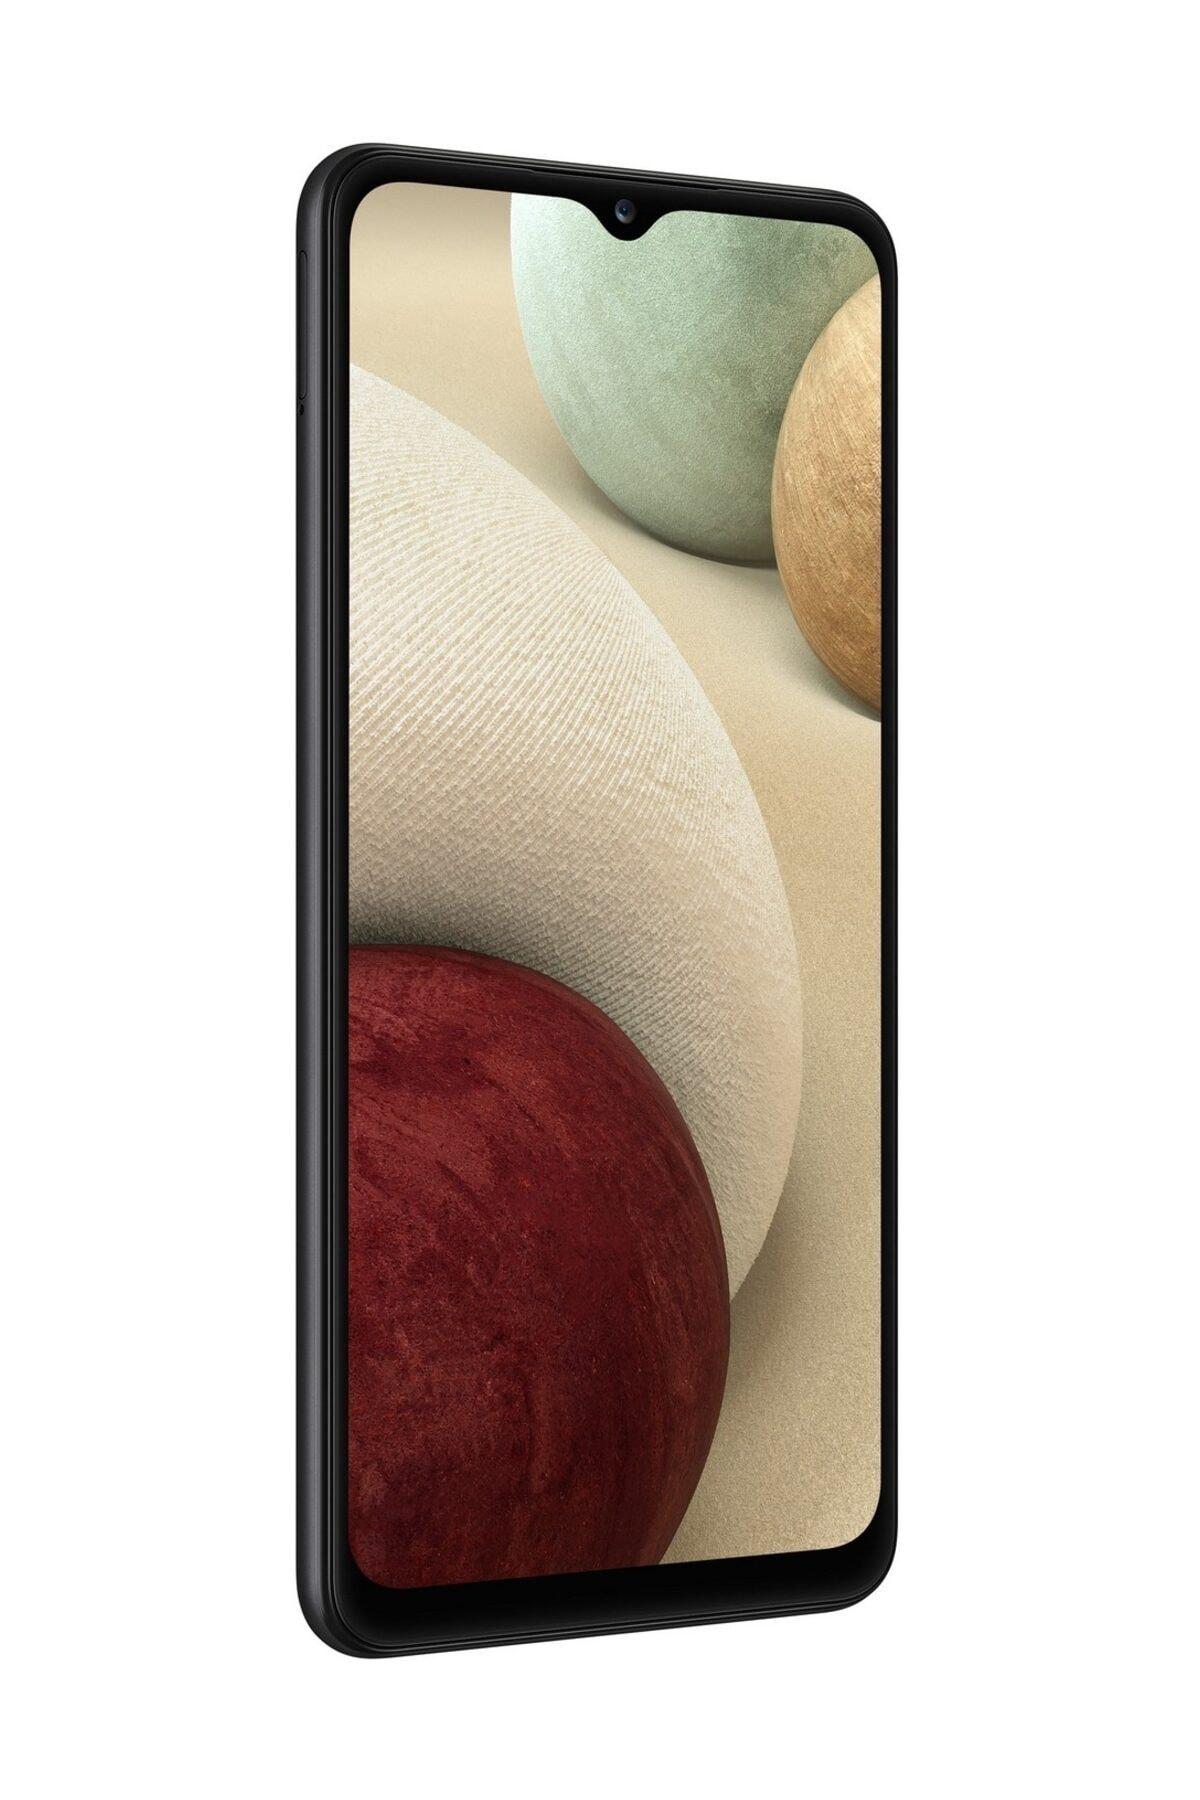 Galaxy A12 64GB Siyah Cep Telefonu (Samsung Türkiye Garantili)